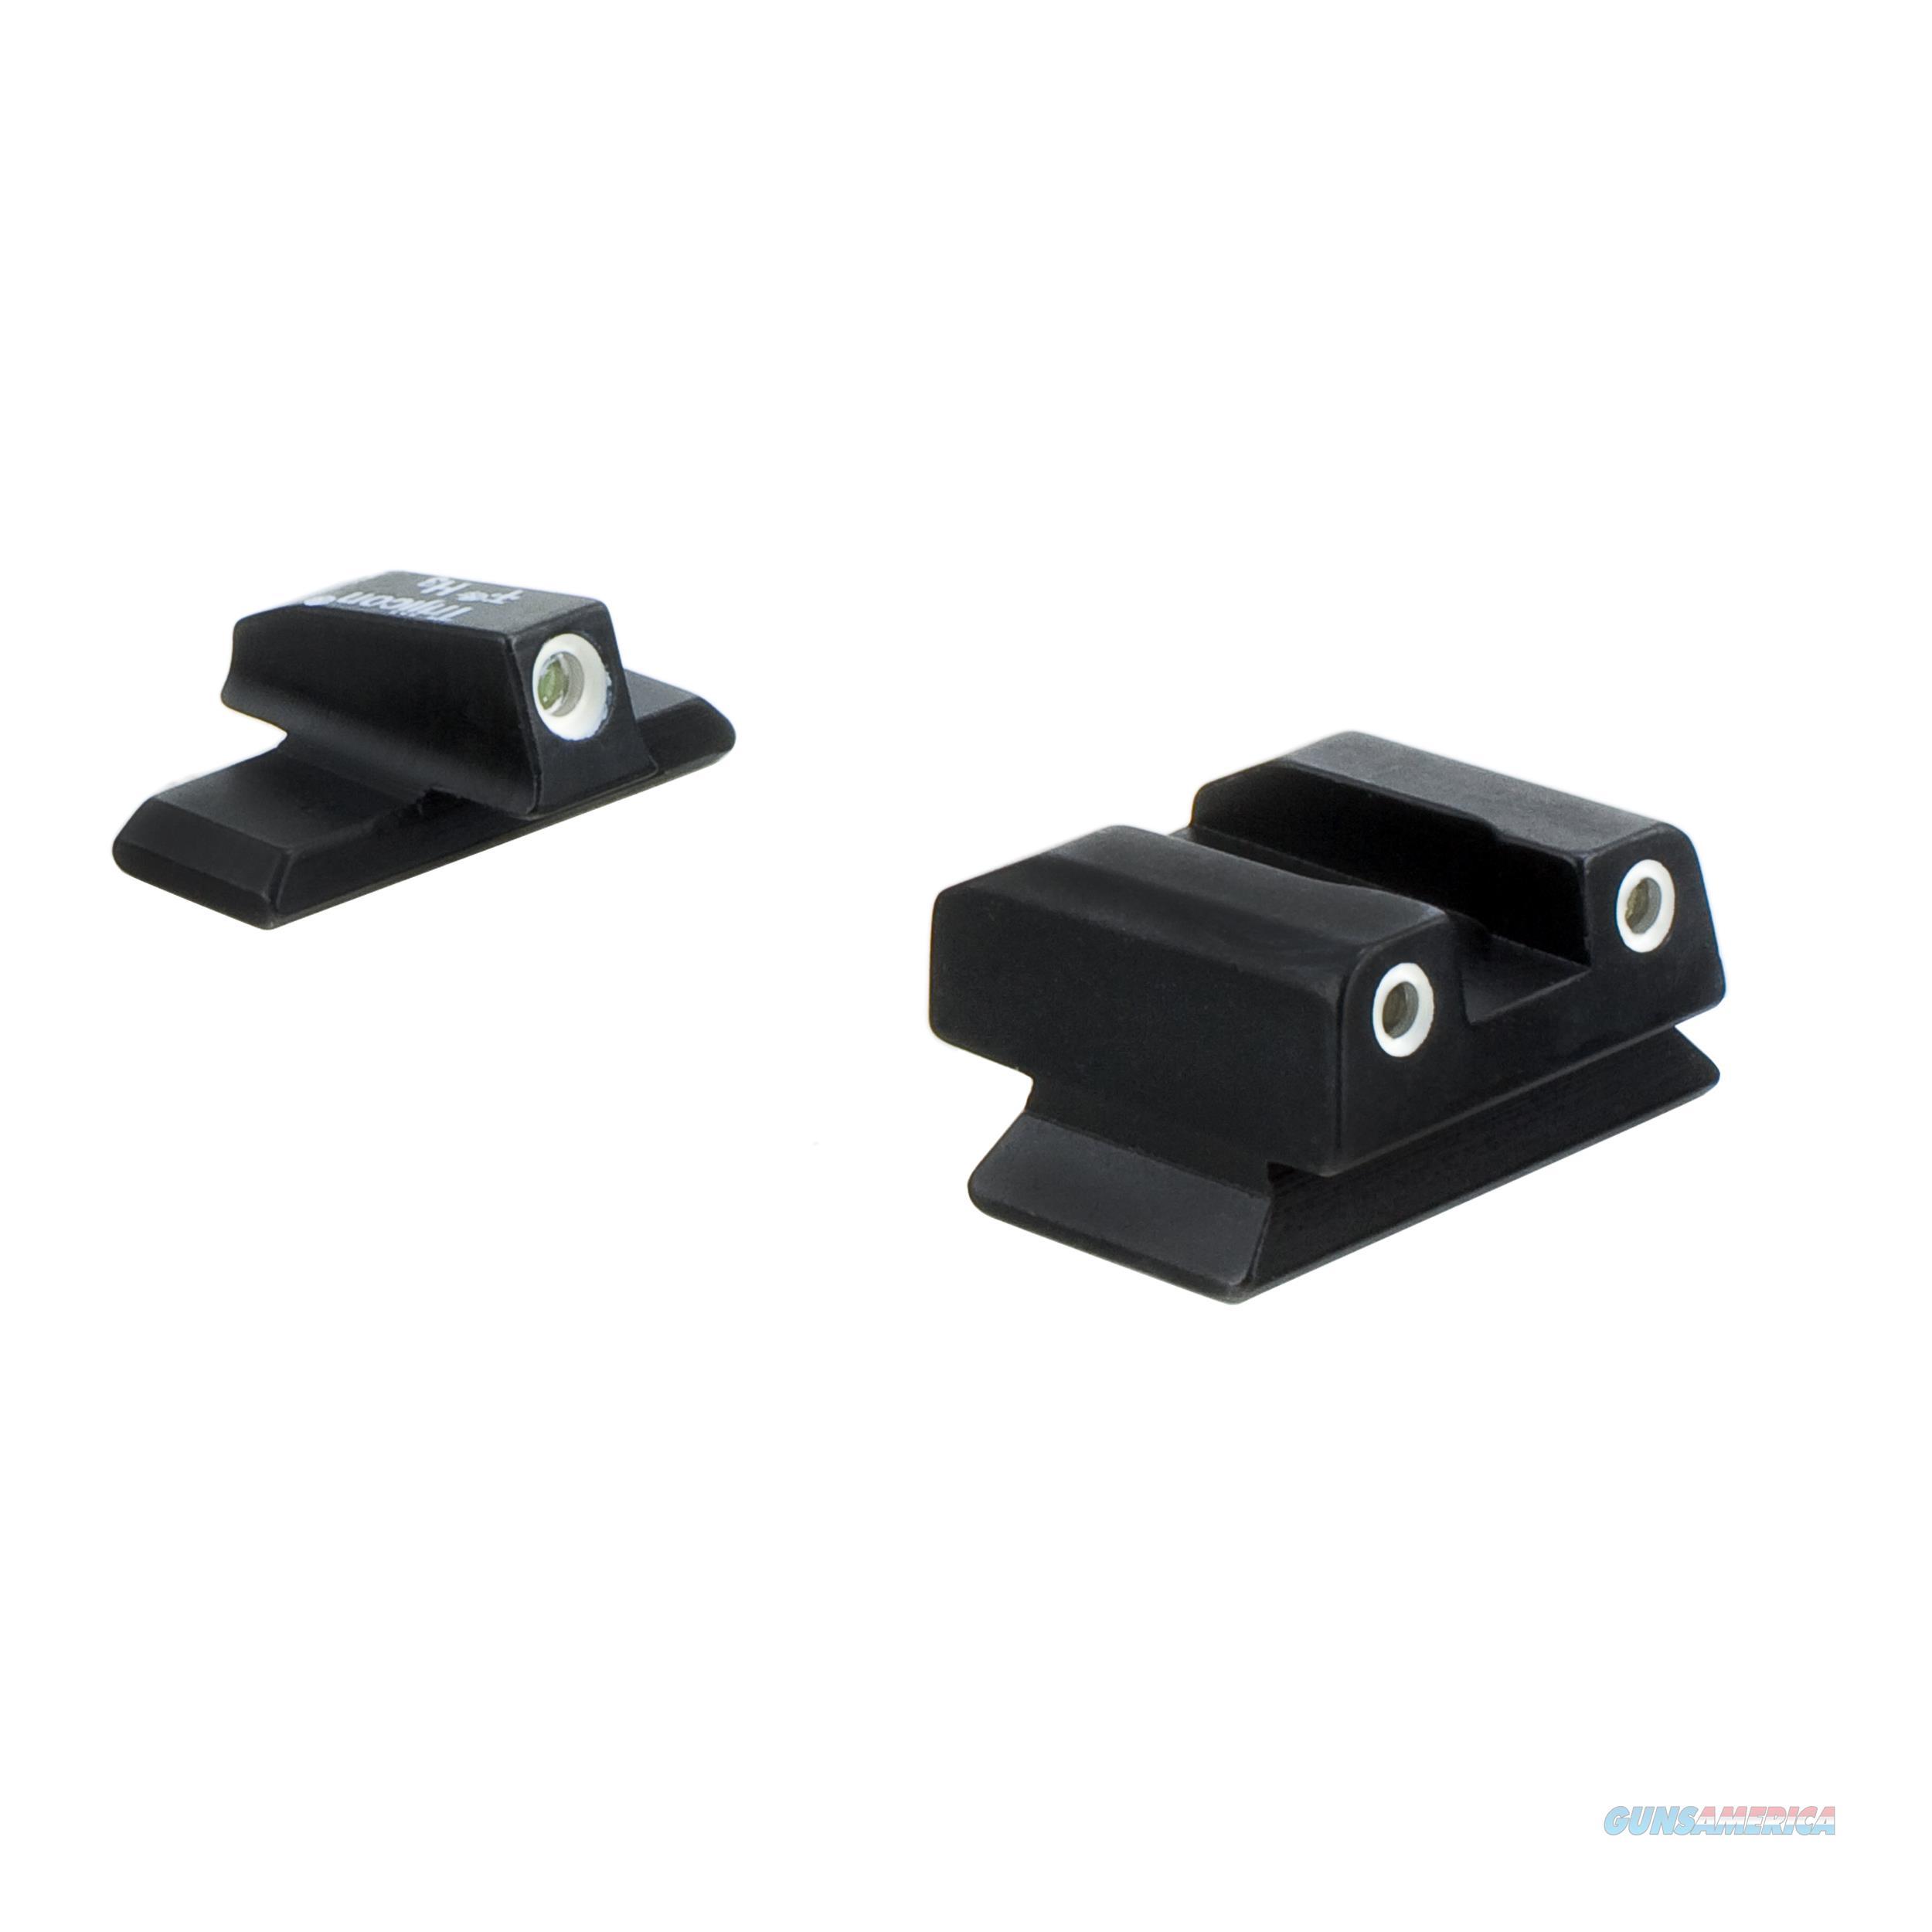 Trijicon Beretta Bright And Tough 3 Dot Night Sight Set BE14-C-600765  Non-Guns > Iron/Metal/Peep Sights